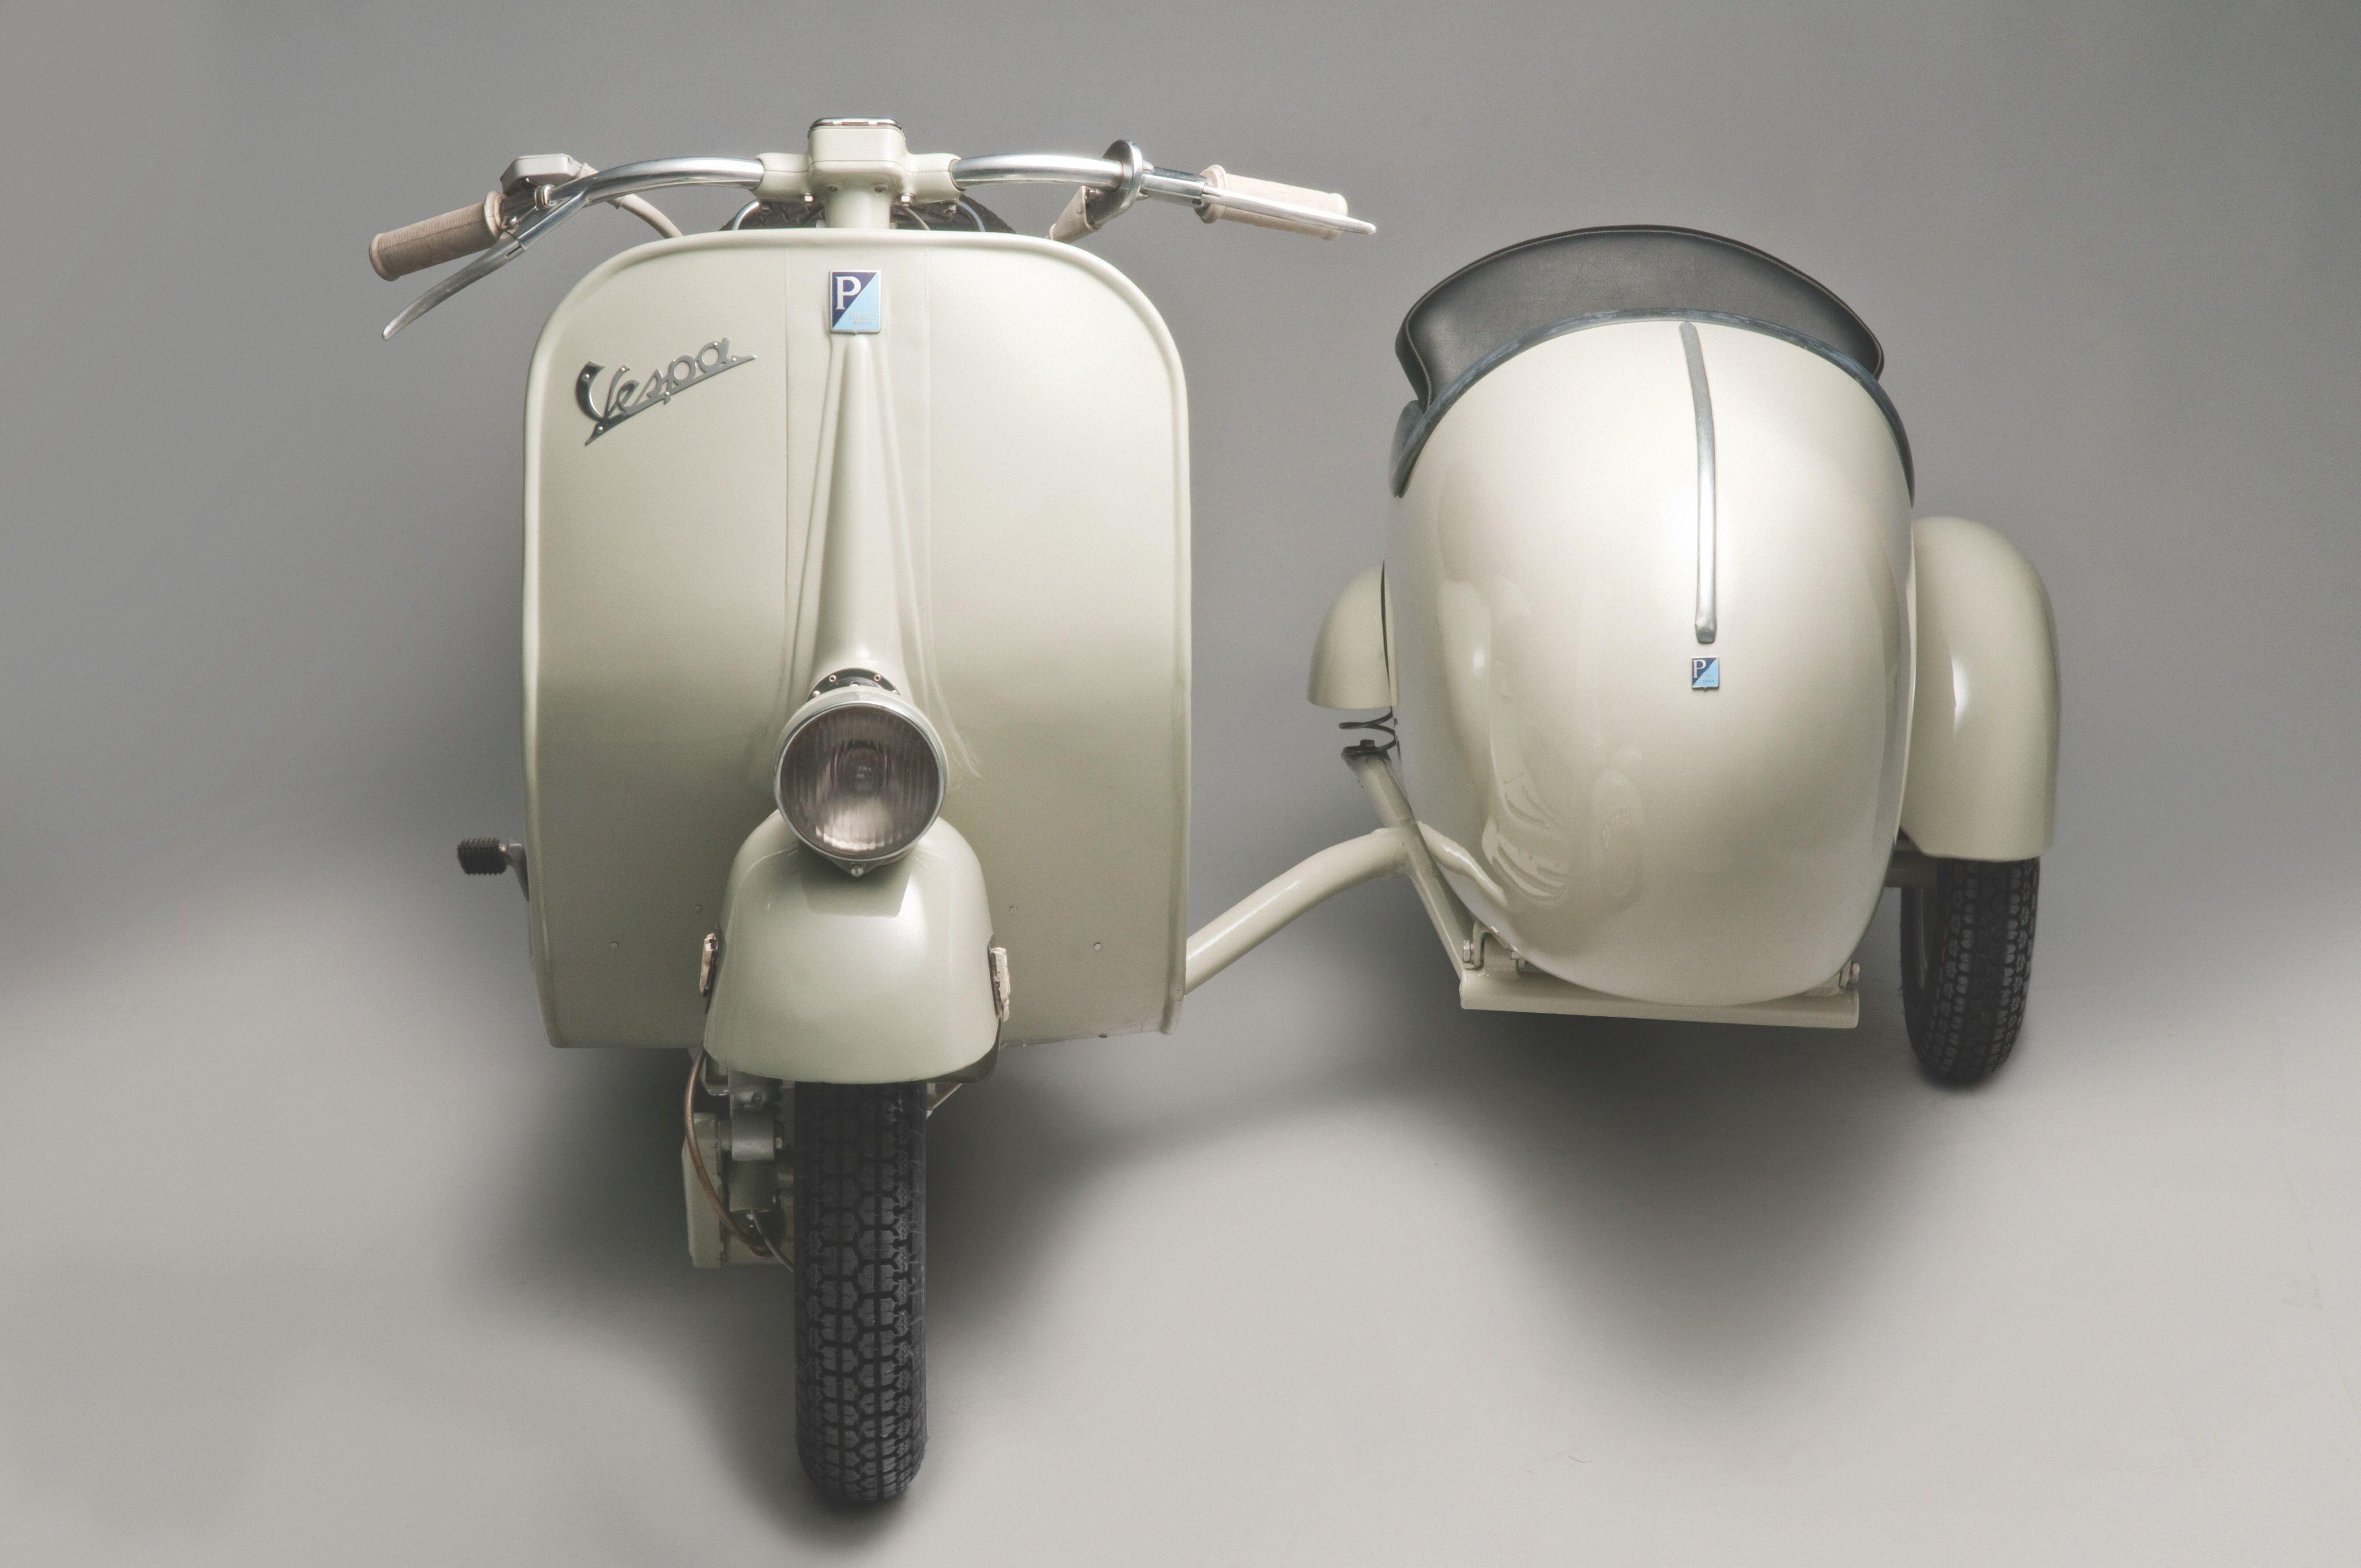 Vespa 125 sidecar piagio | motos con sidecar | Sidecars